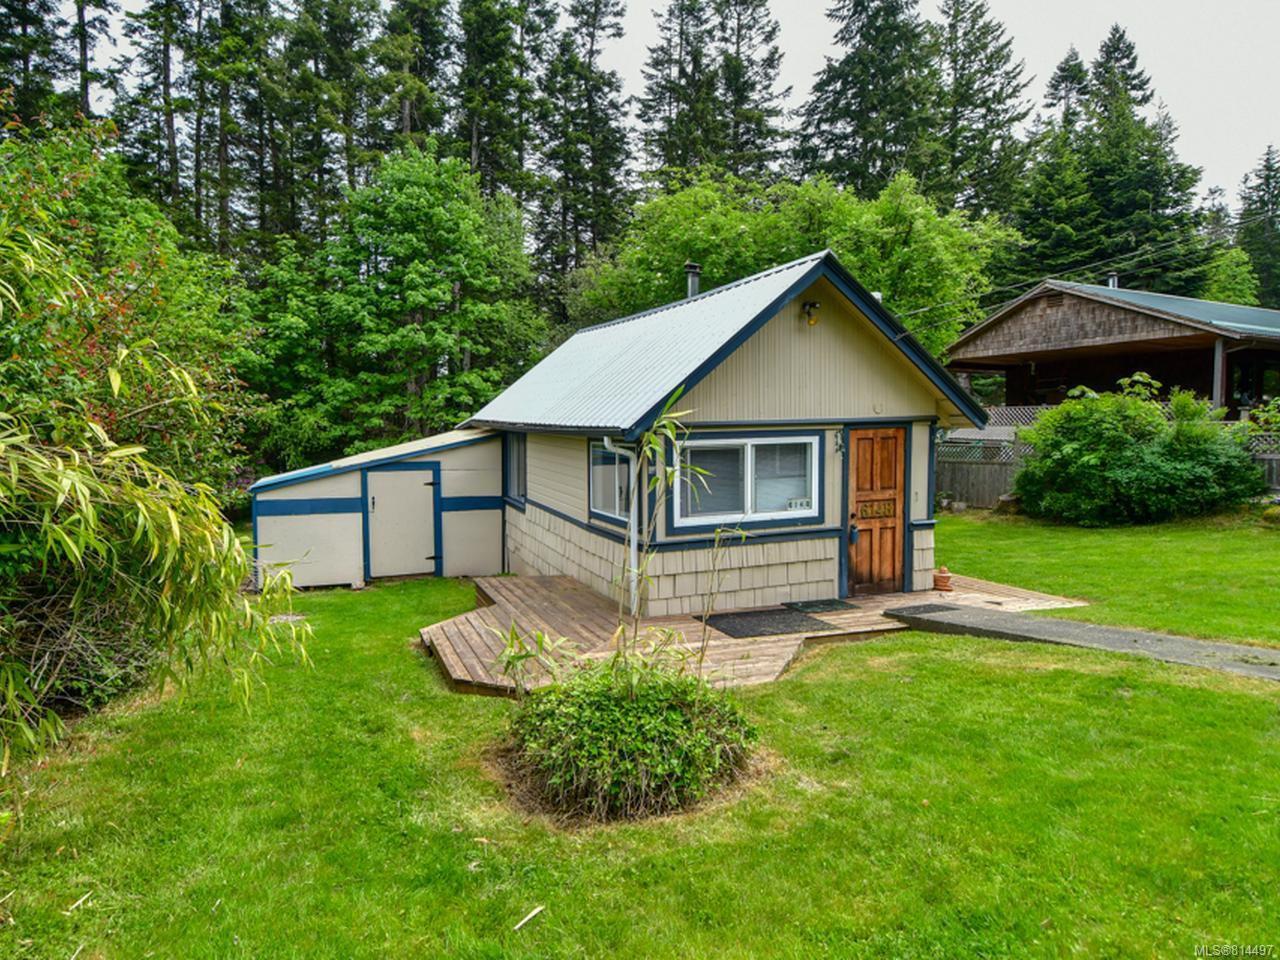 Main Photo: 6148 Aldergrove Dr in COURTENAY: CV Courtenay North House for sale (Comox Valley)  : MLS®# 814497